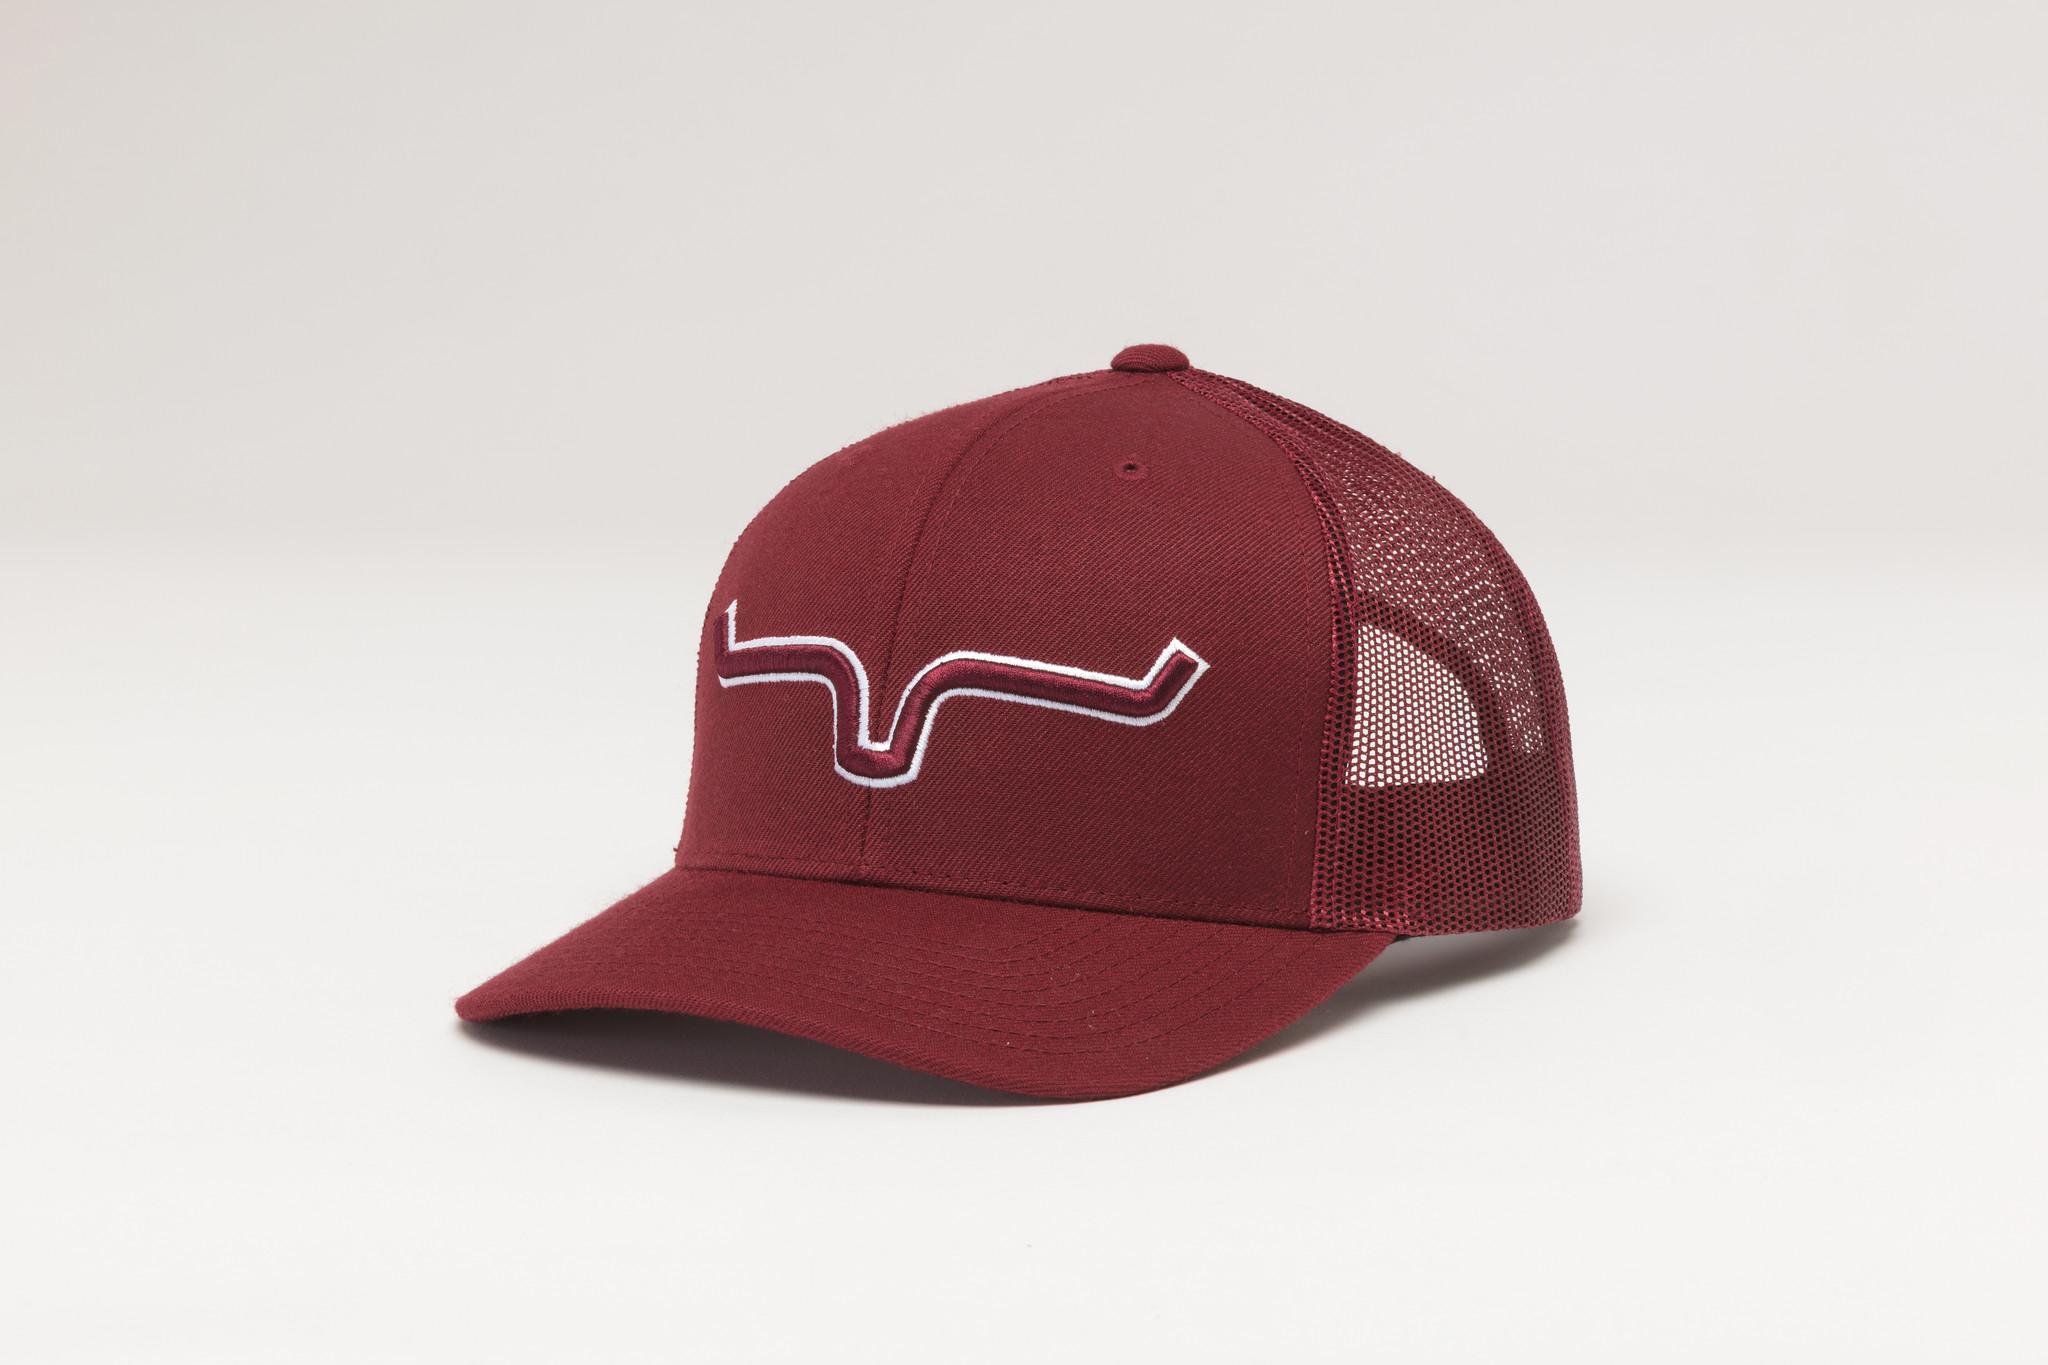 Kimes Ranch Major Leagues Trucker Burgundy